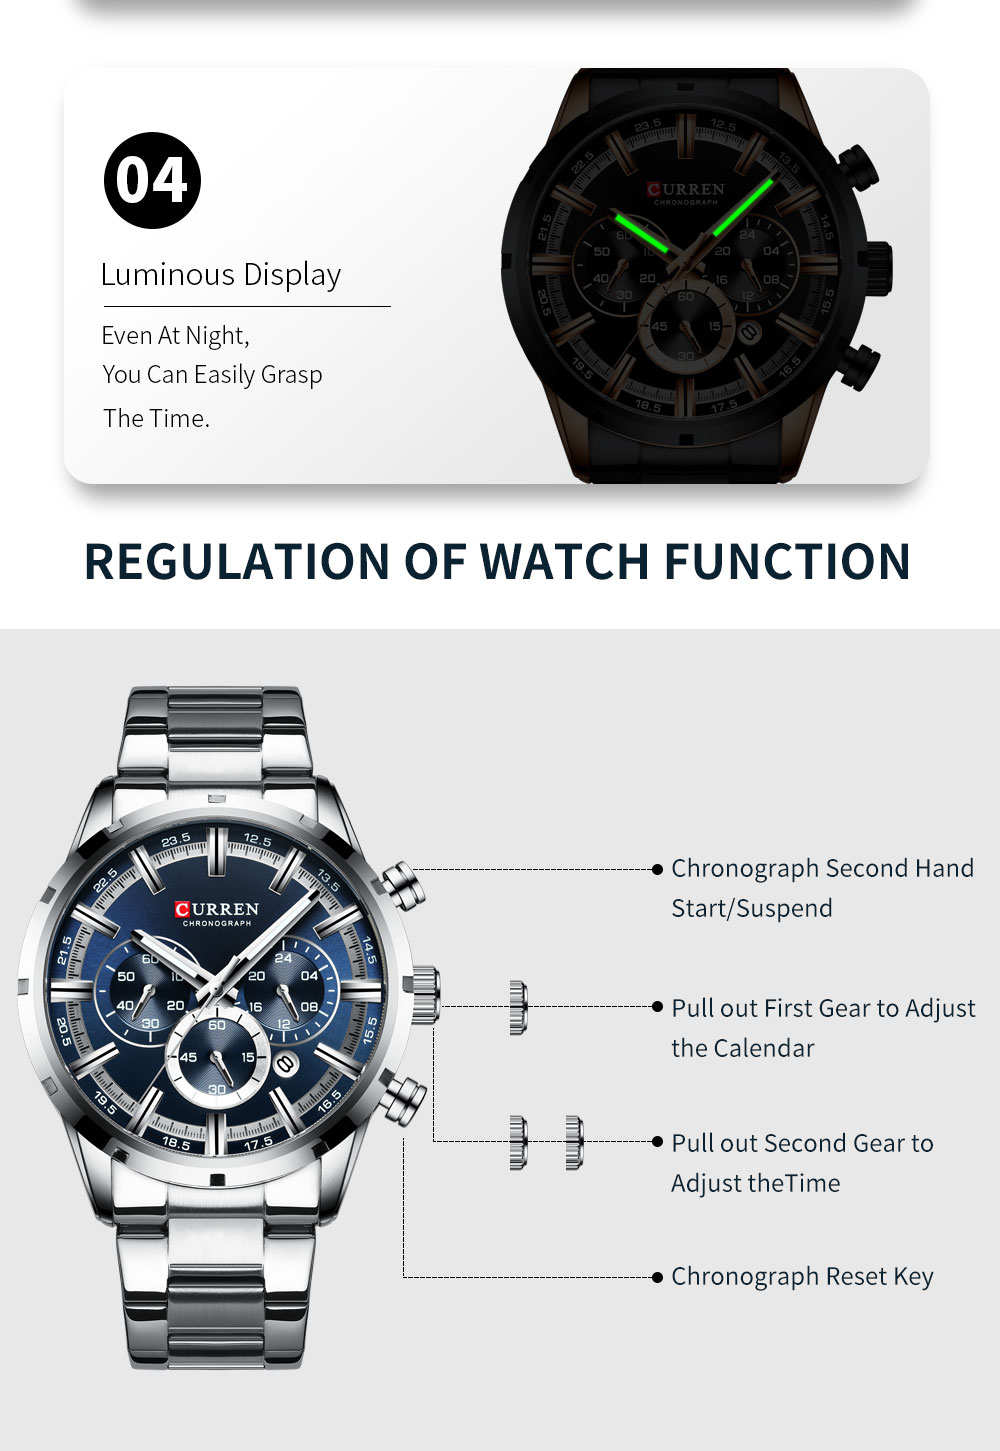 Hc540a07bb1104bbda886c929247c829db CURREN Top Brand Military Quartz Watches Silver Clock Mens Quartz Stainless Steel Chronograph Watch for Men Casual Sporty Watch